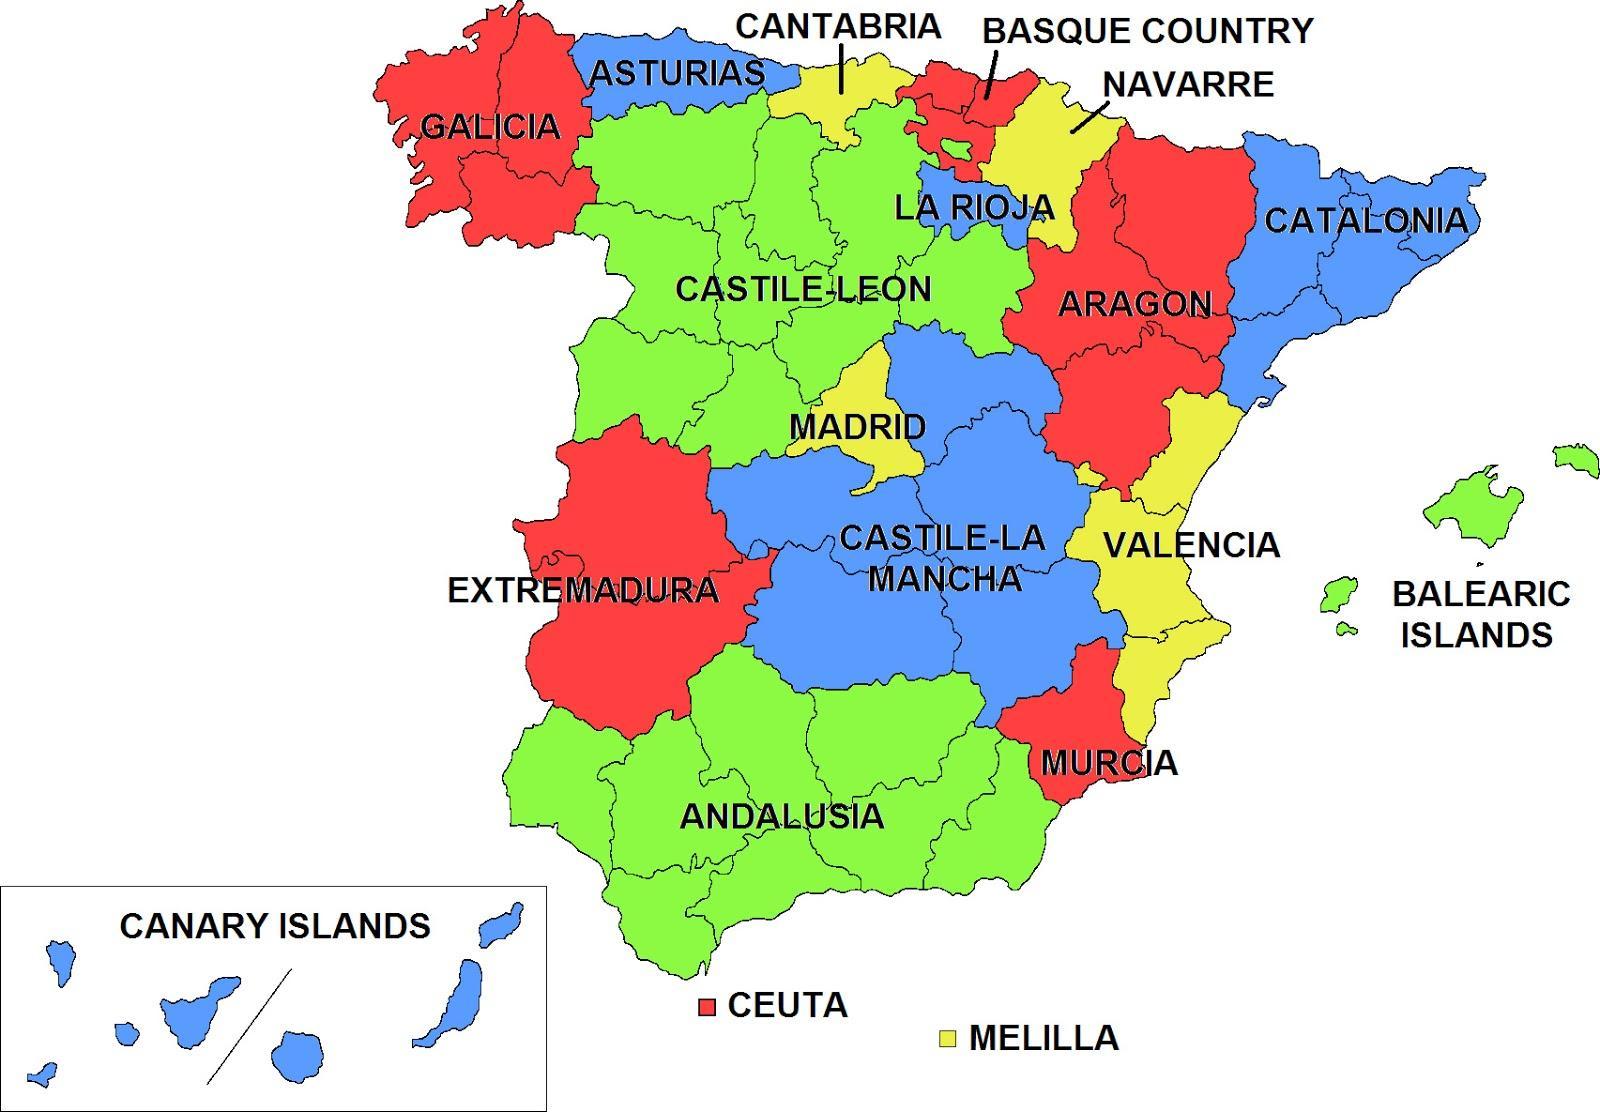 Espanjan Autonomisten Alueiden Kartta Kartta Espanjan